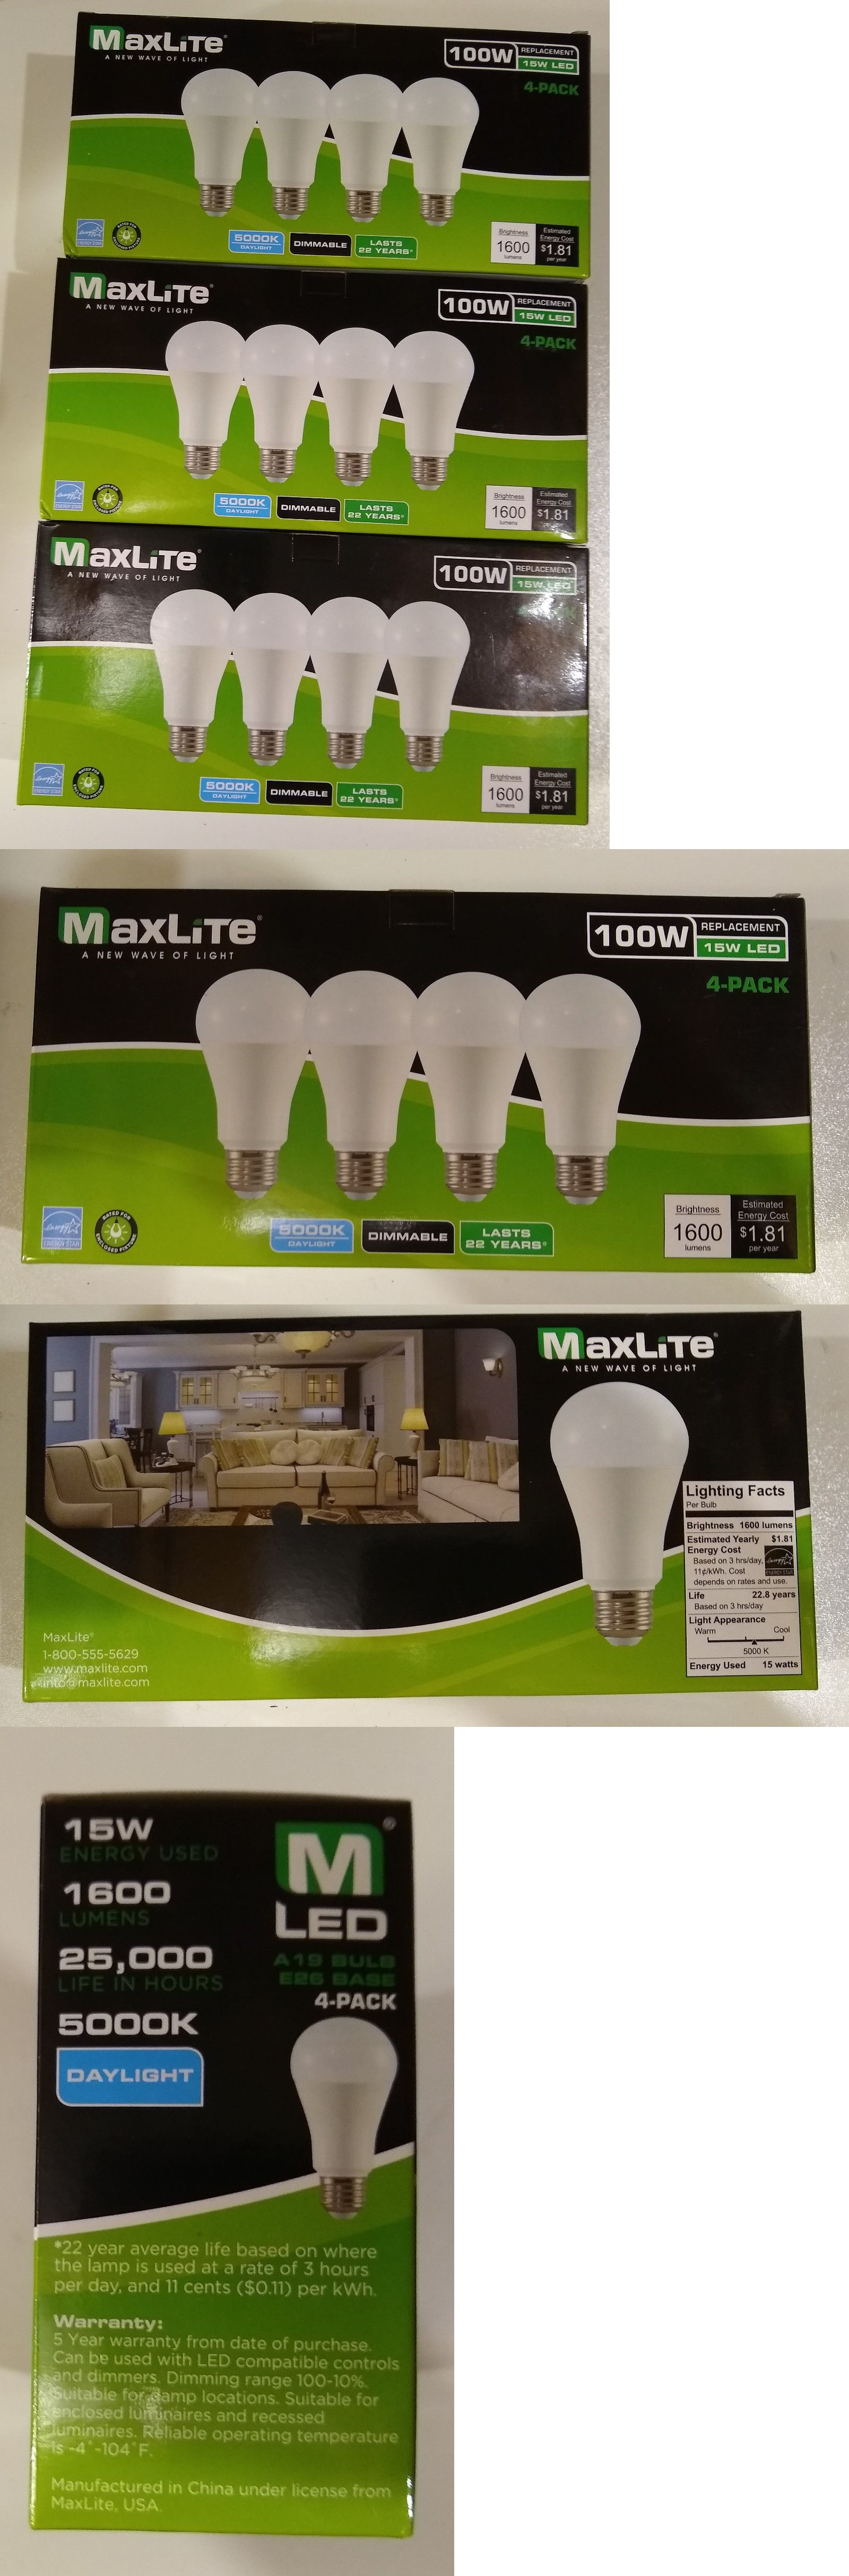 Light Bulbs 20706 12 Led Light Bulbs Maxlite 15w 100w Eq 1600 Lumens Daylight White A19 Dimmable Buy It Now Only 24 99 On E Bulbs For Sale Bulb Led